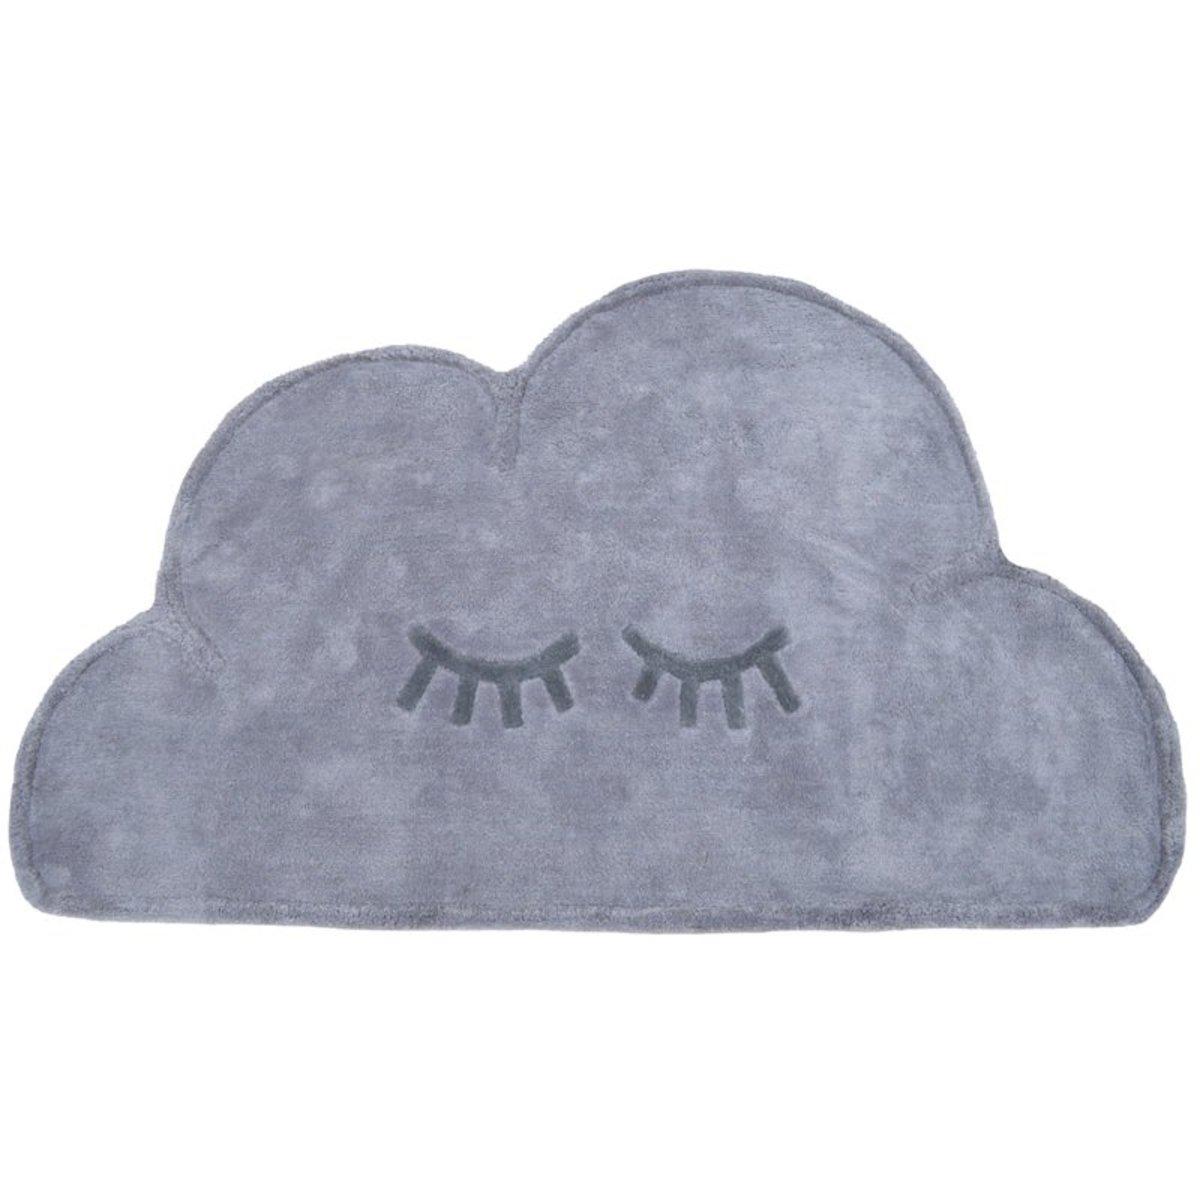 Detský koberec Mráčik - šedý Cloud 60x110 cm